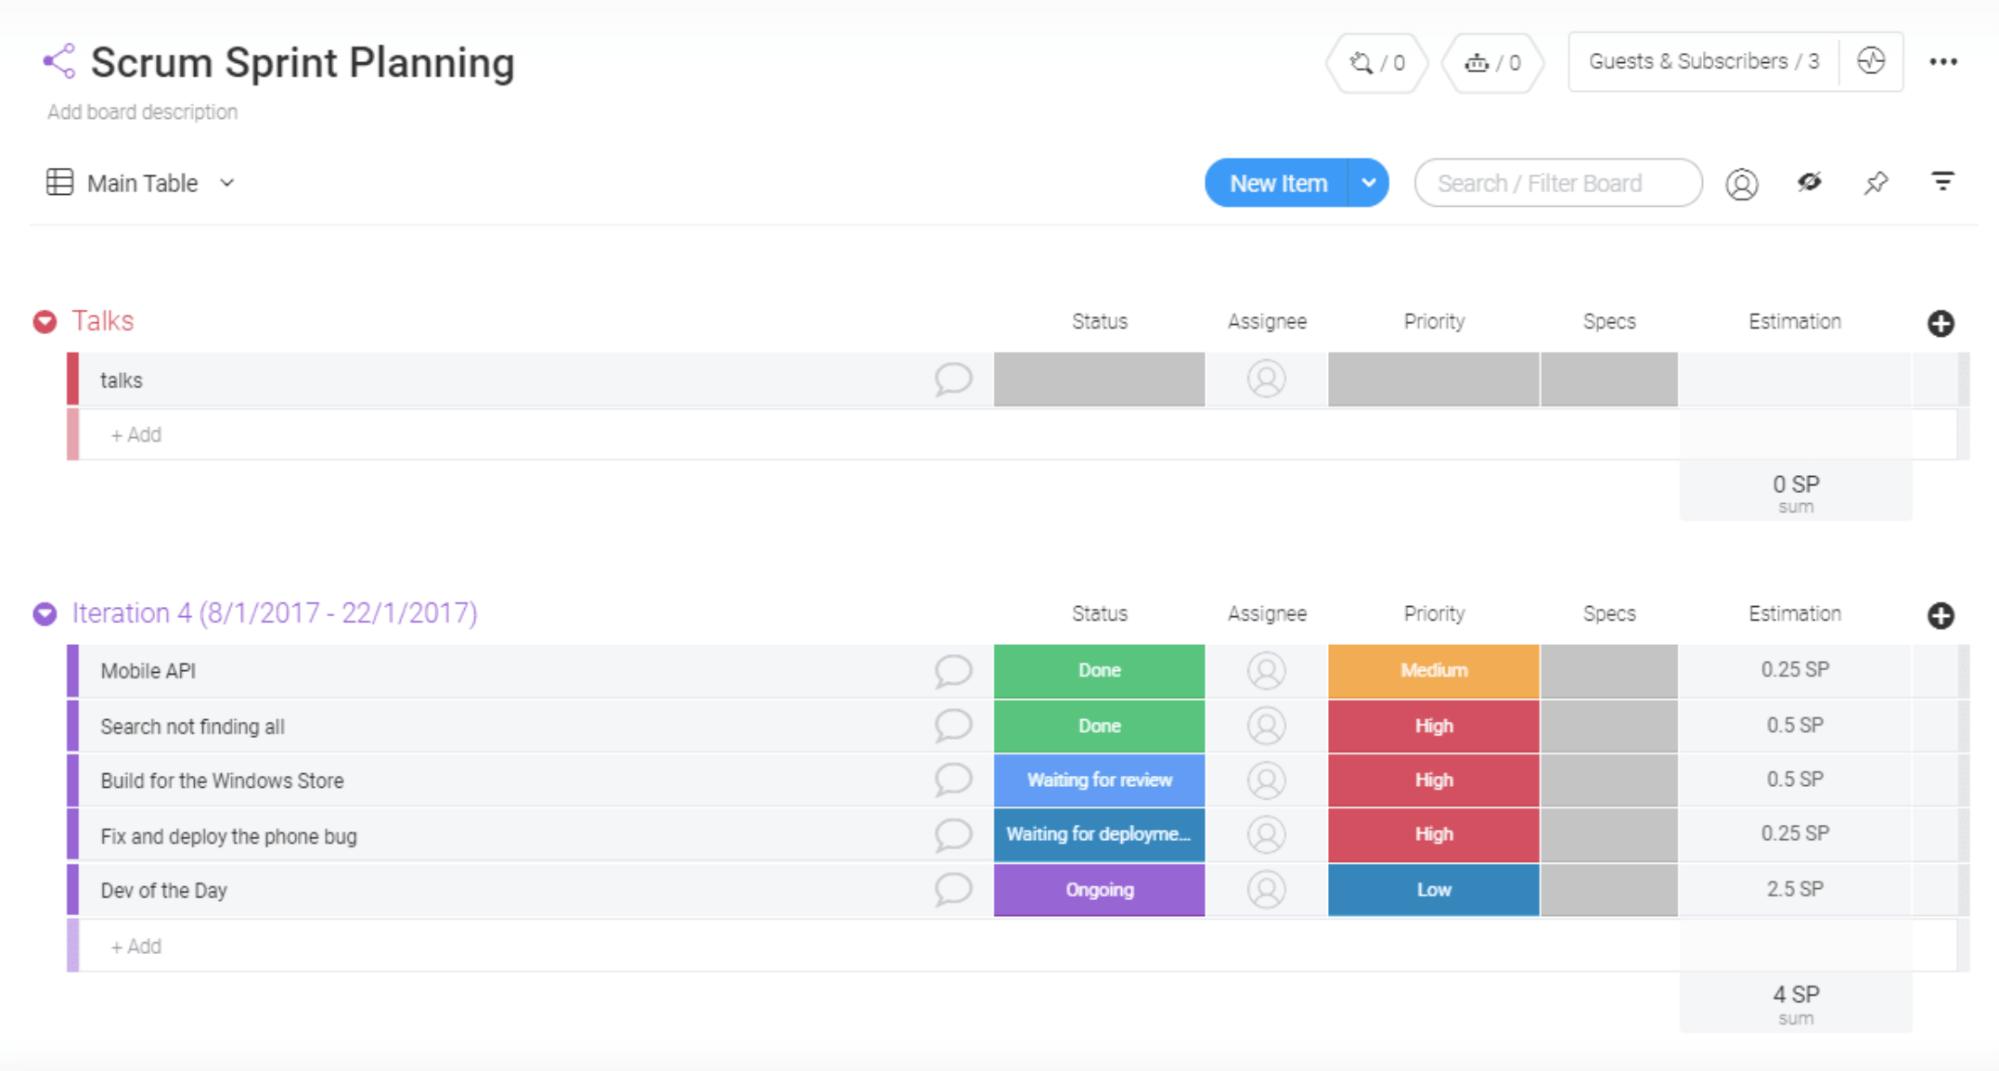 spring planning monday.com scrum planning template